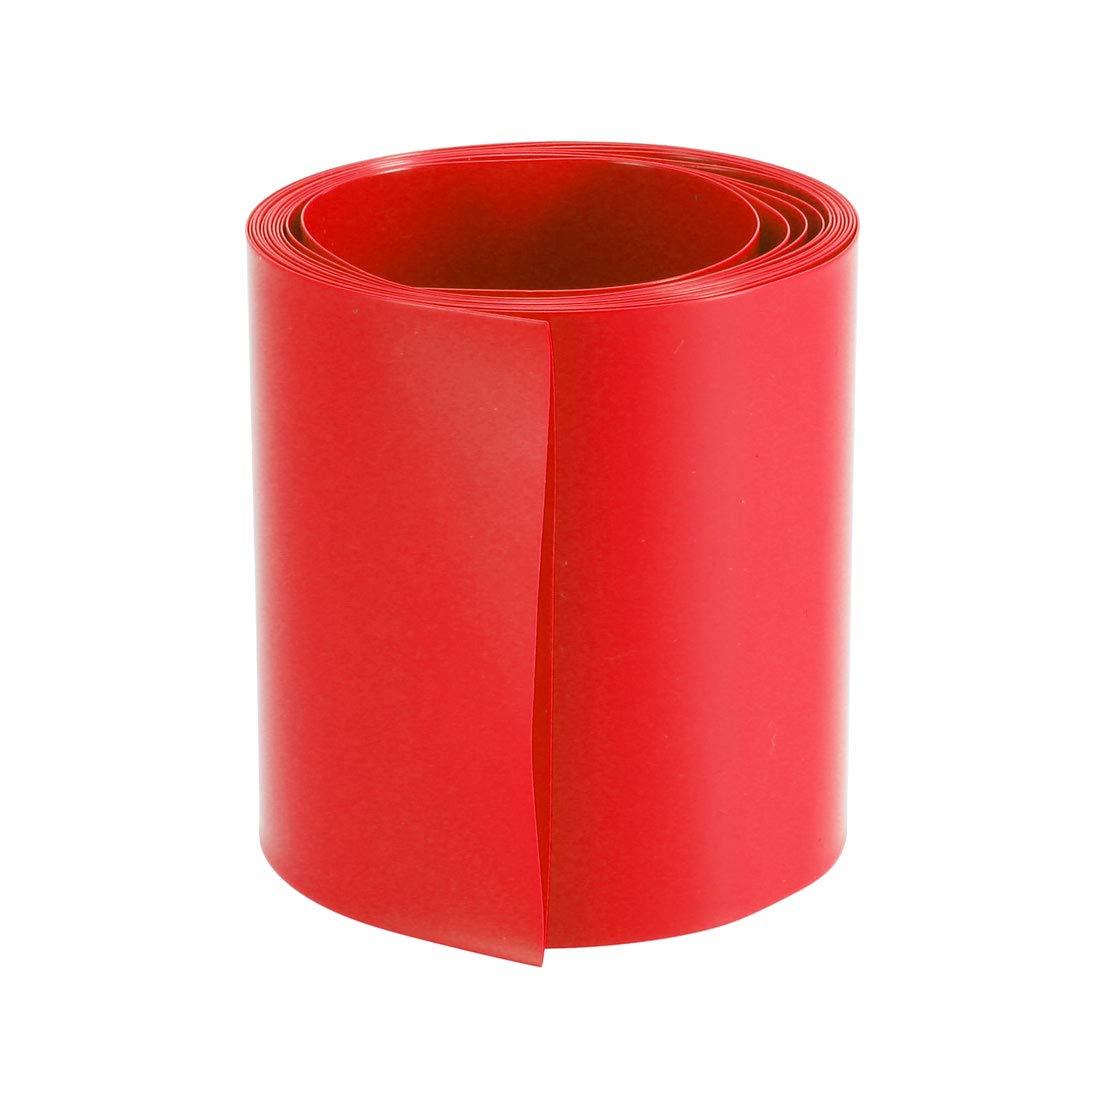 sourcing map PVC Termoretr/áctil Tubo 66mm Plano Ancho para Bricolaje AA 2 Metros Rojo